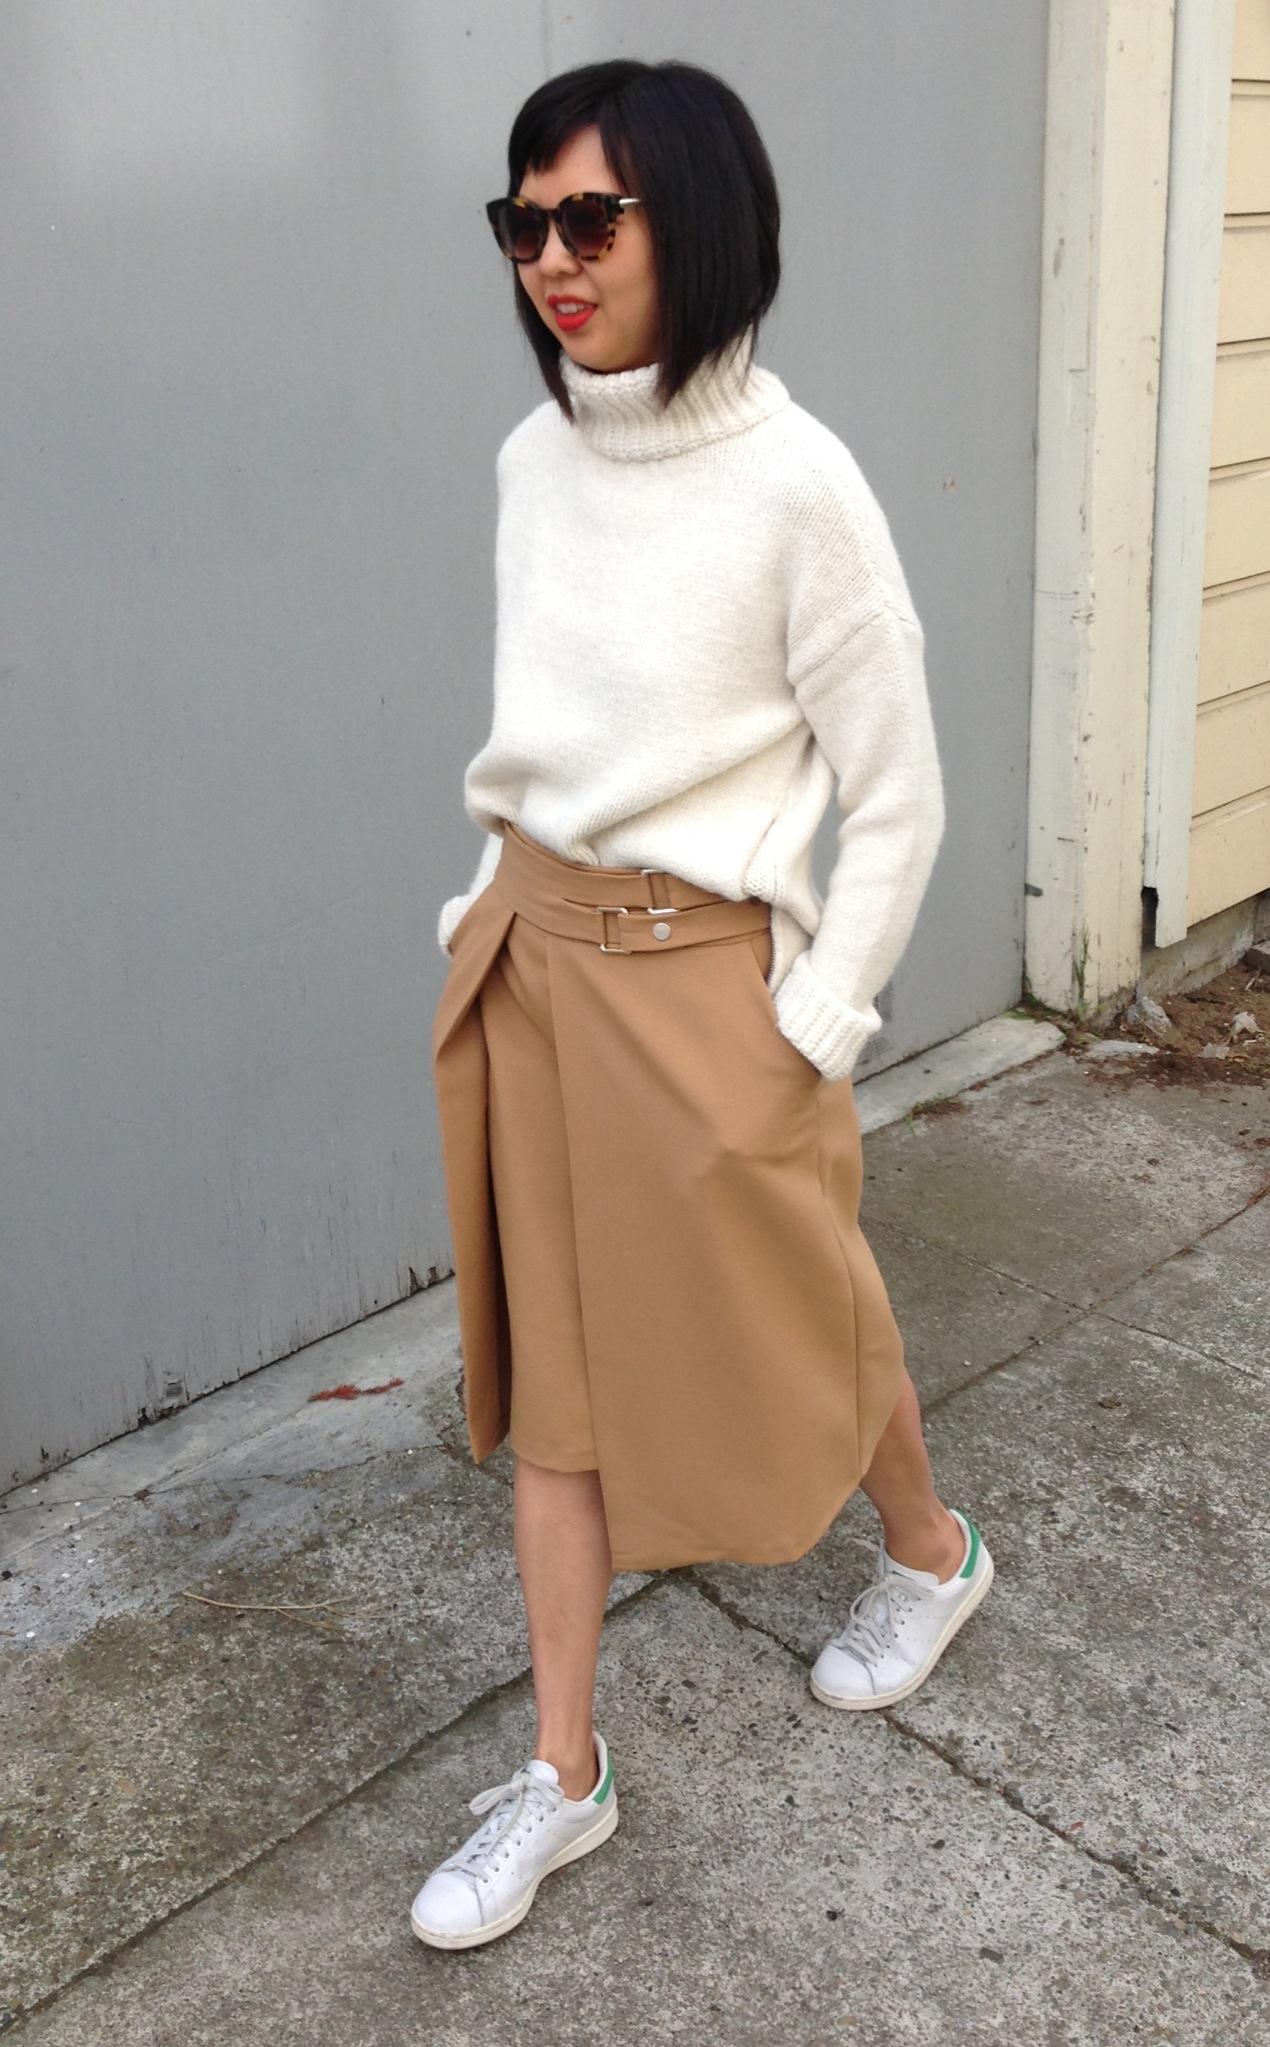 08405c8124 zara side zip sweater and zara double buckle skirt